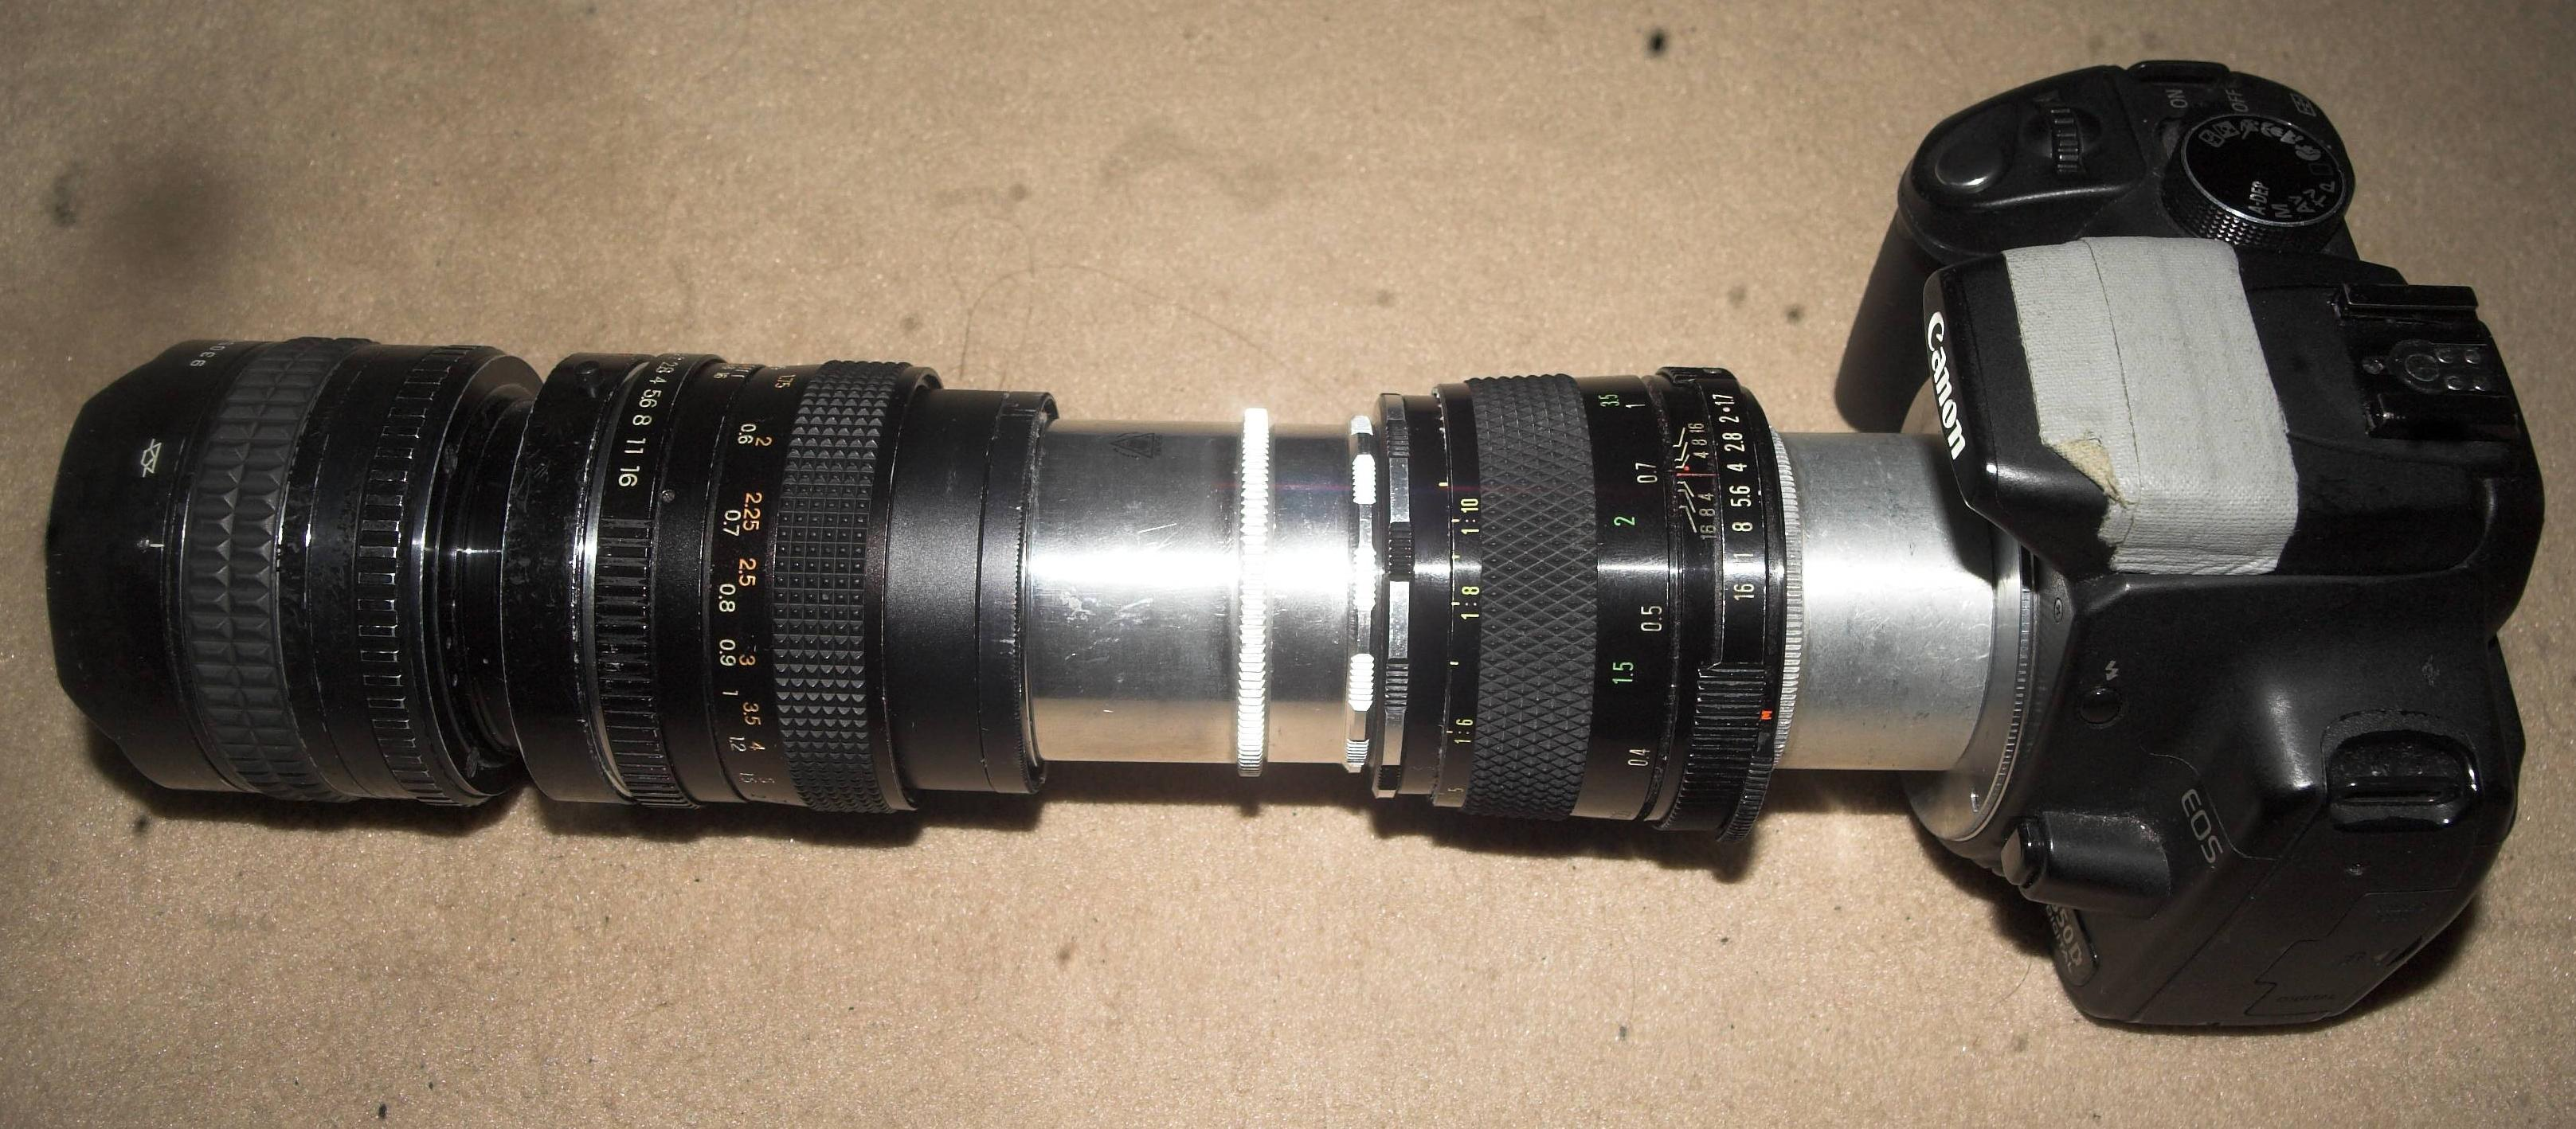 Markus Keinaths Photohomepage - Camera Objektiv Format Adaption